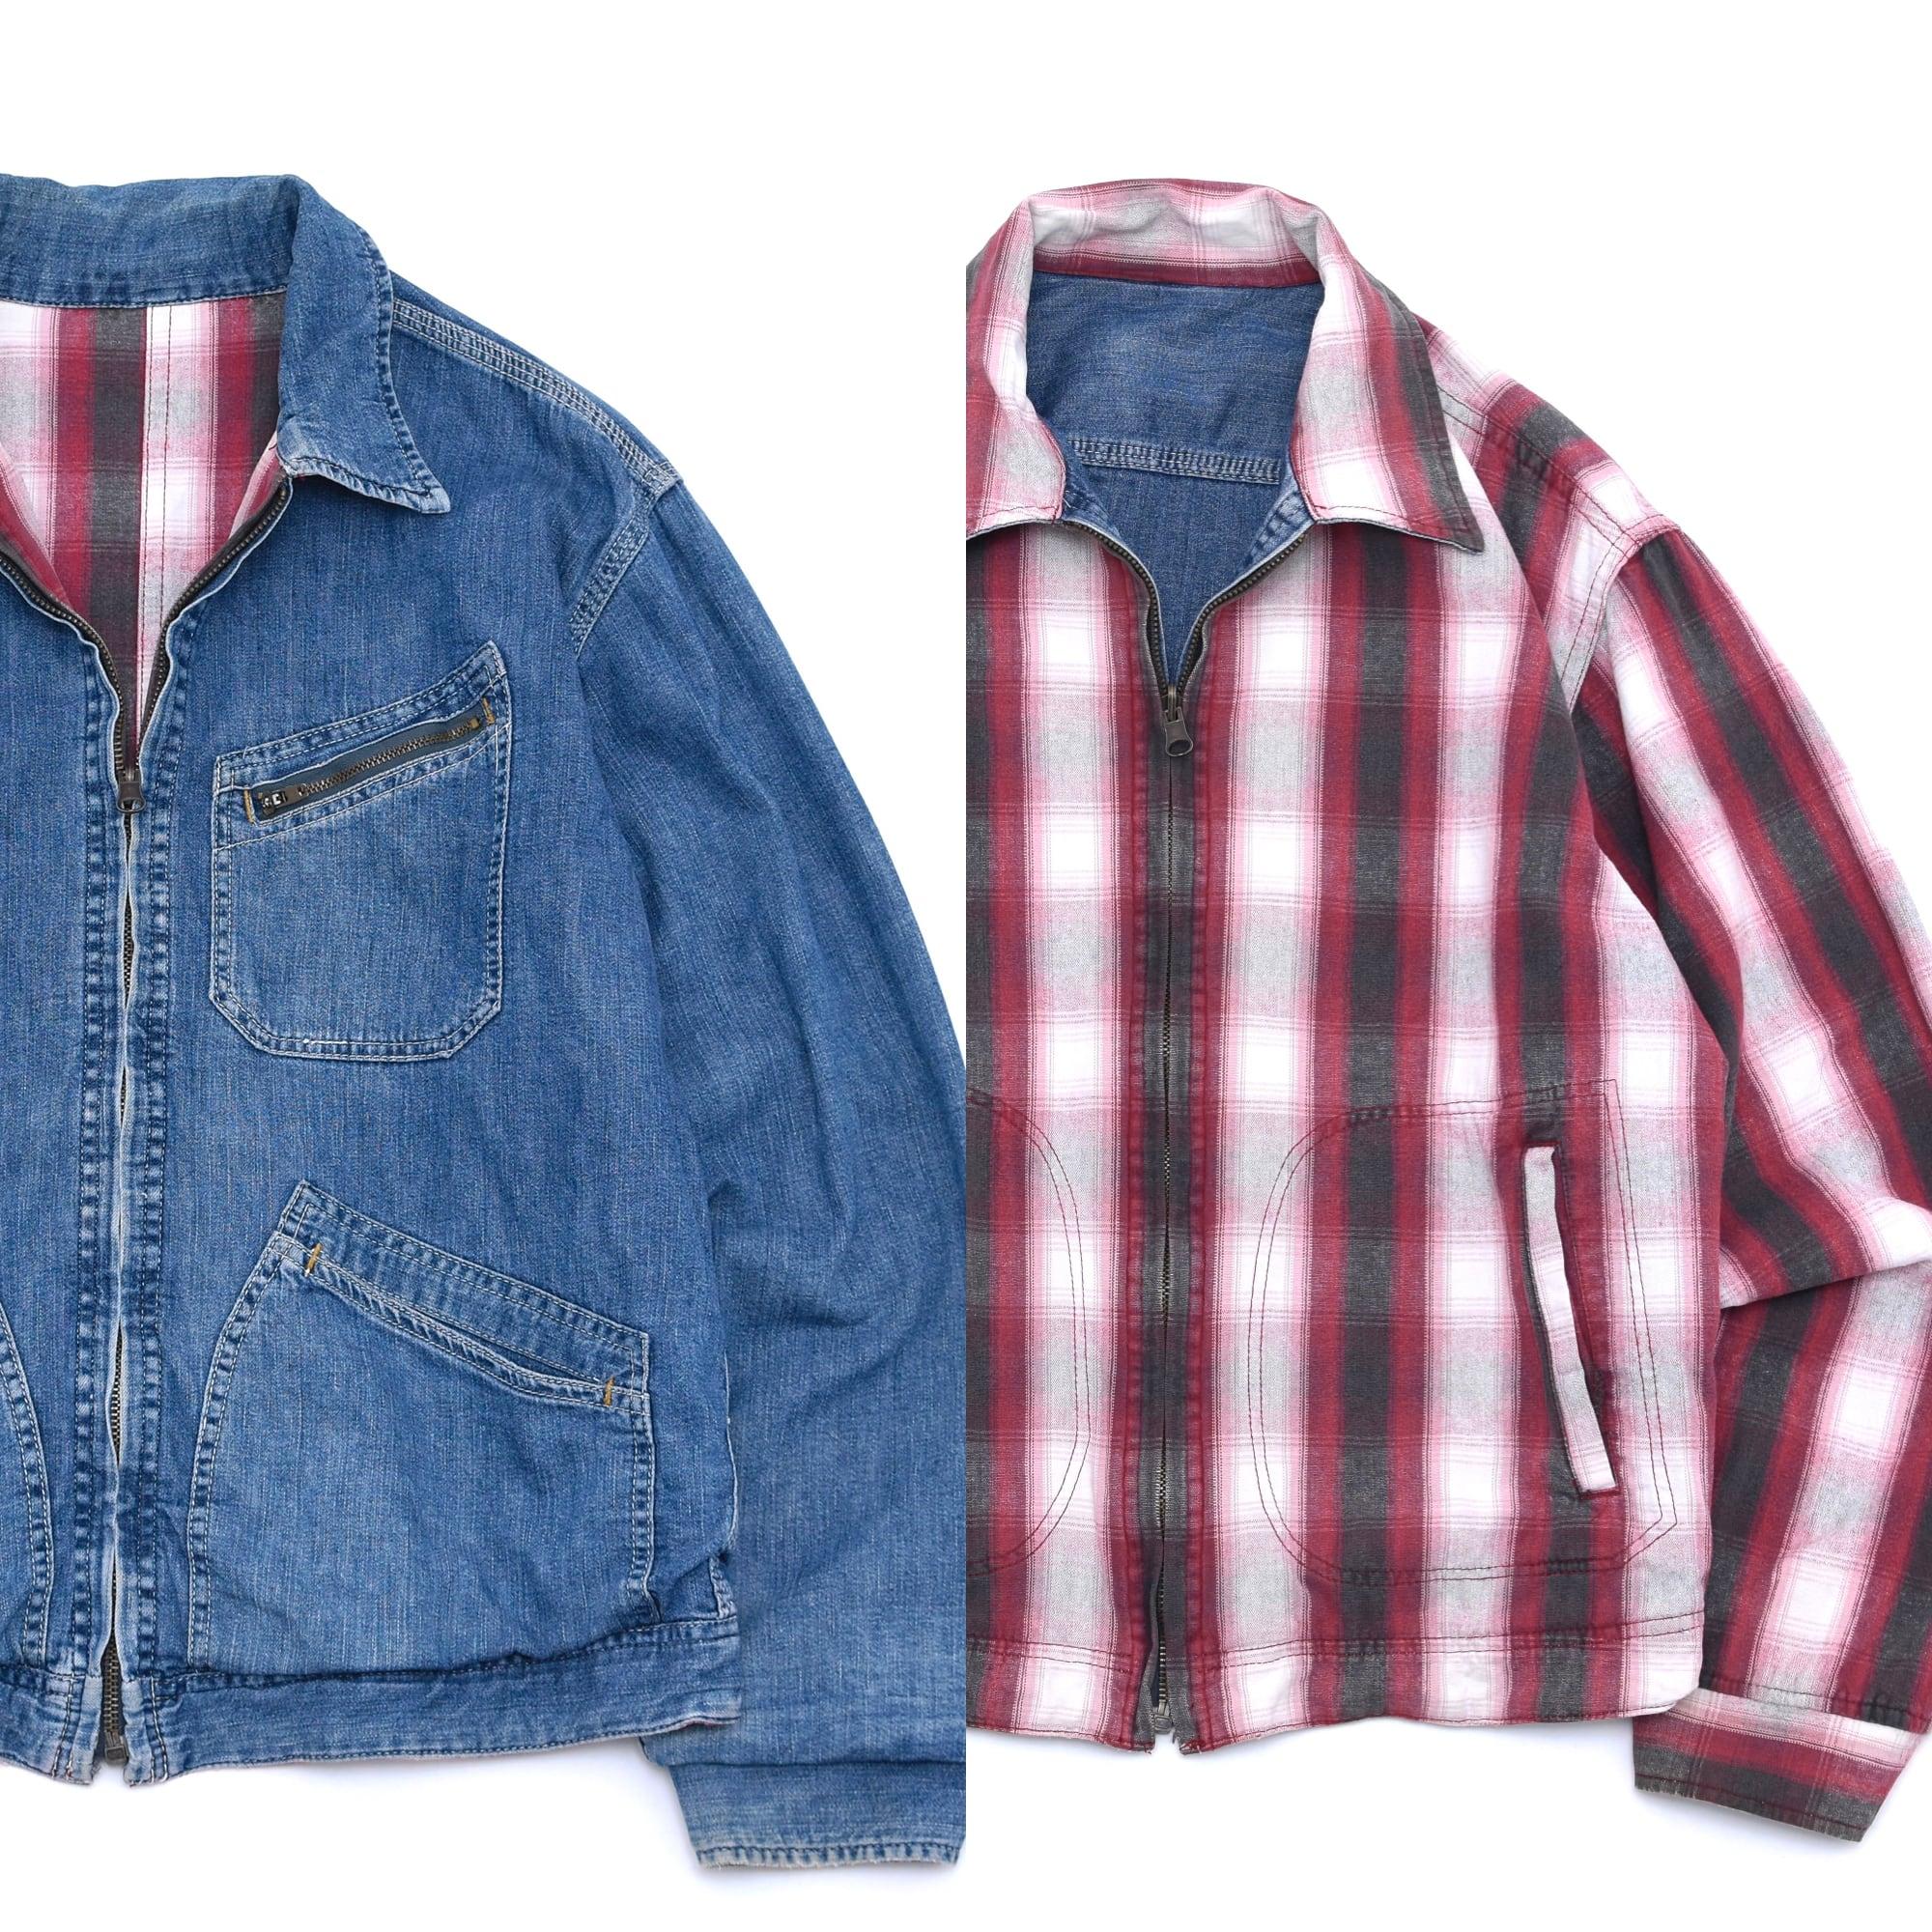 Denim & ombre check reversible vtg jacket